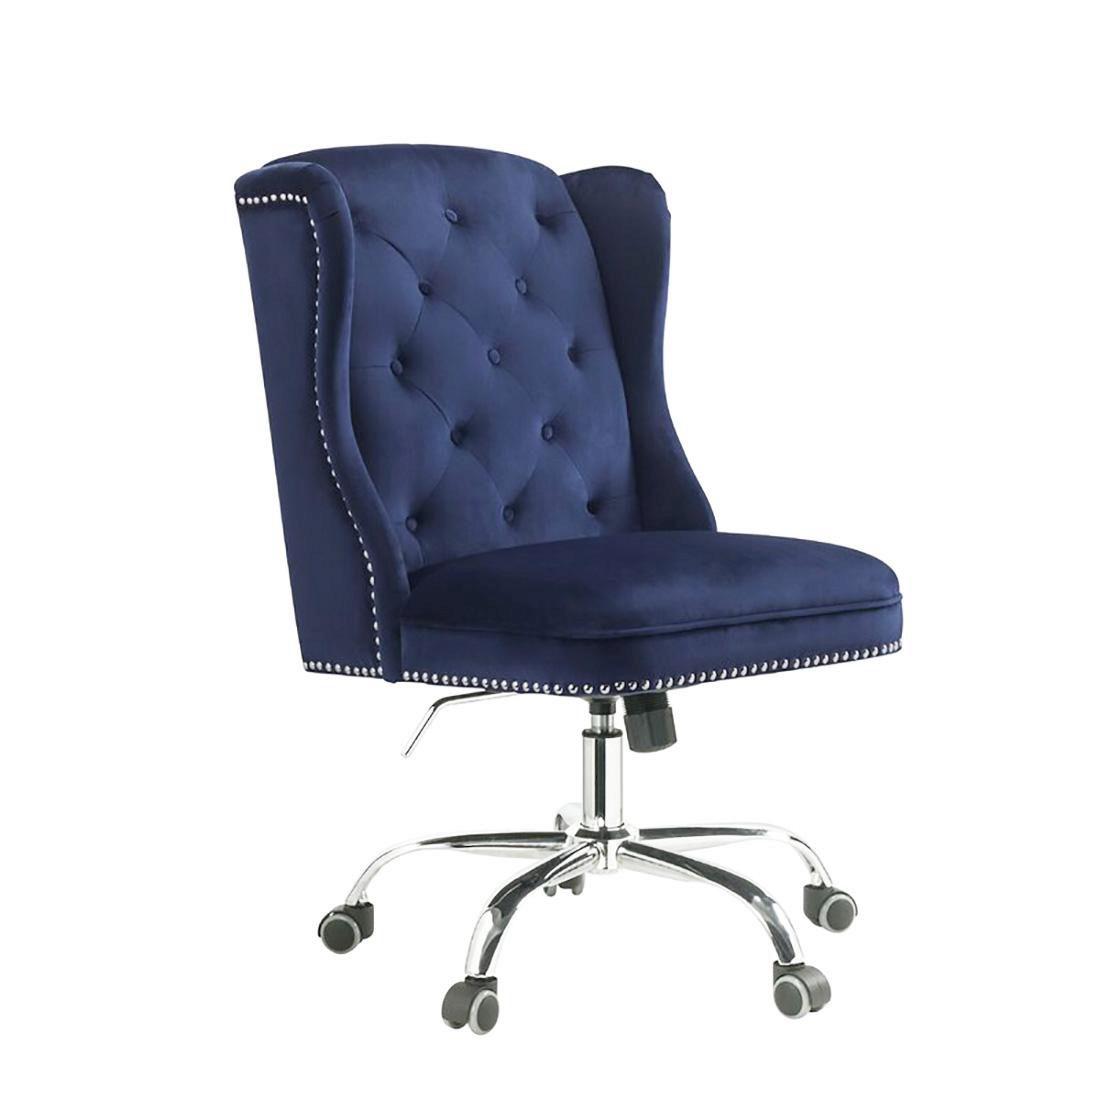 Home Office Chair Midnight Blue Velvet Jamesia 92665 Acme Vintage Contemporary Jamesia 92665 Buy Online